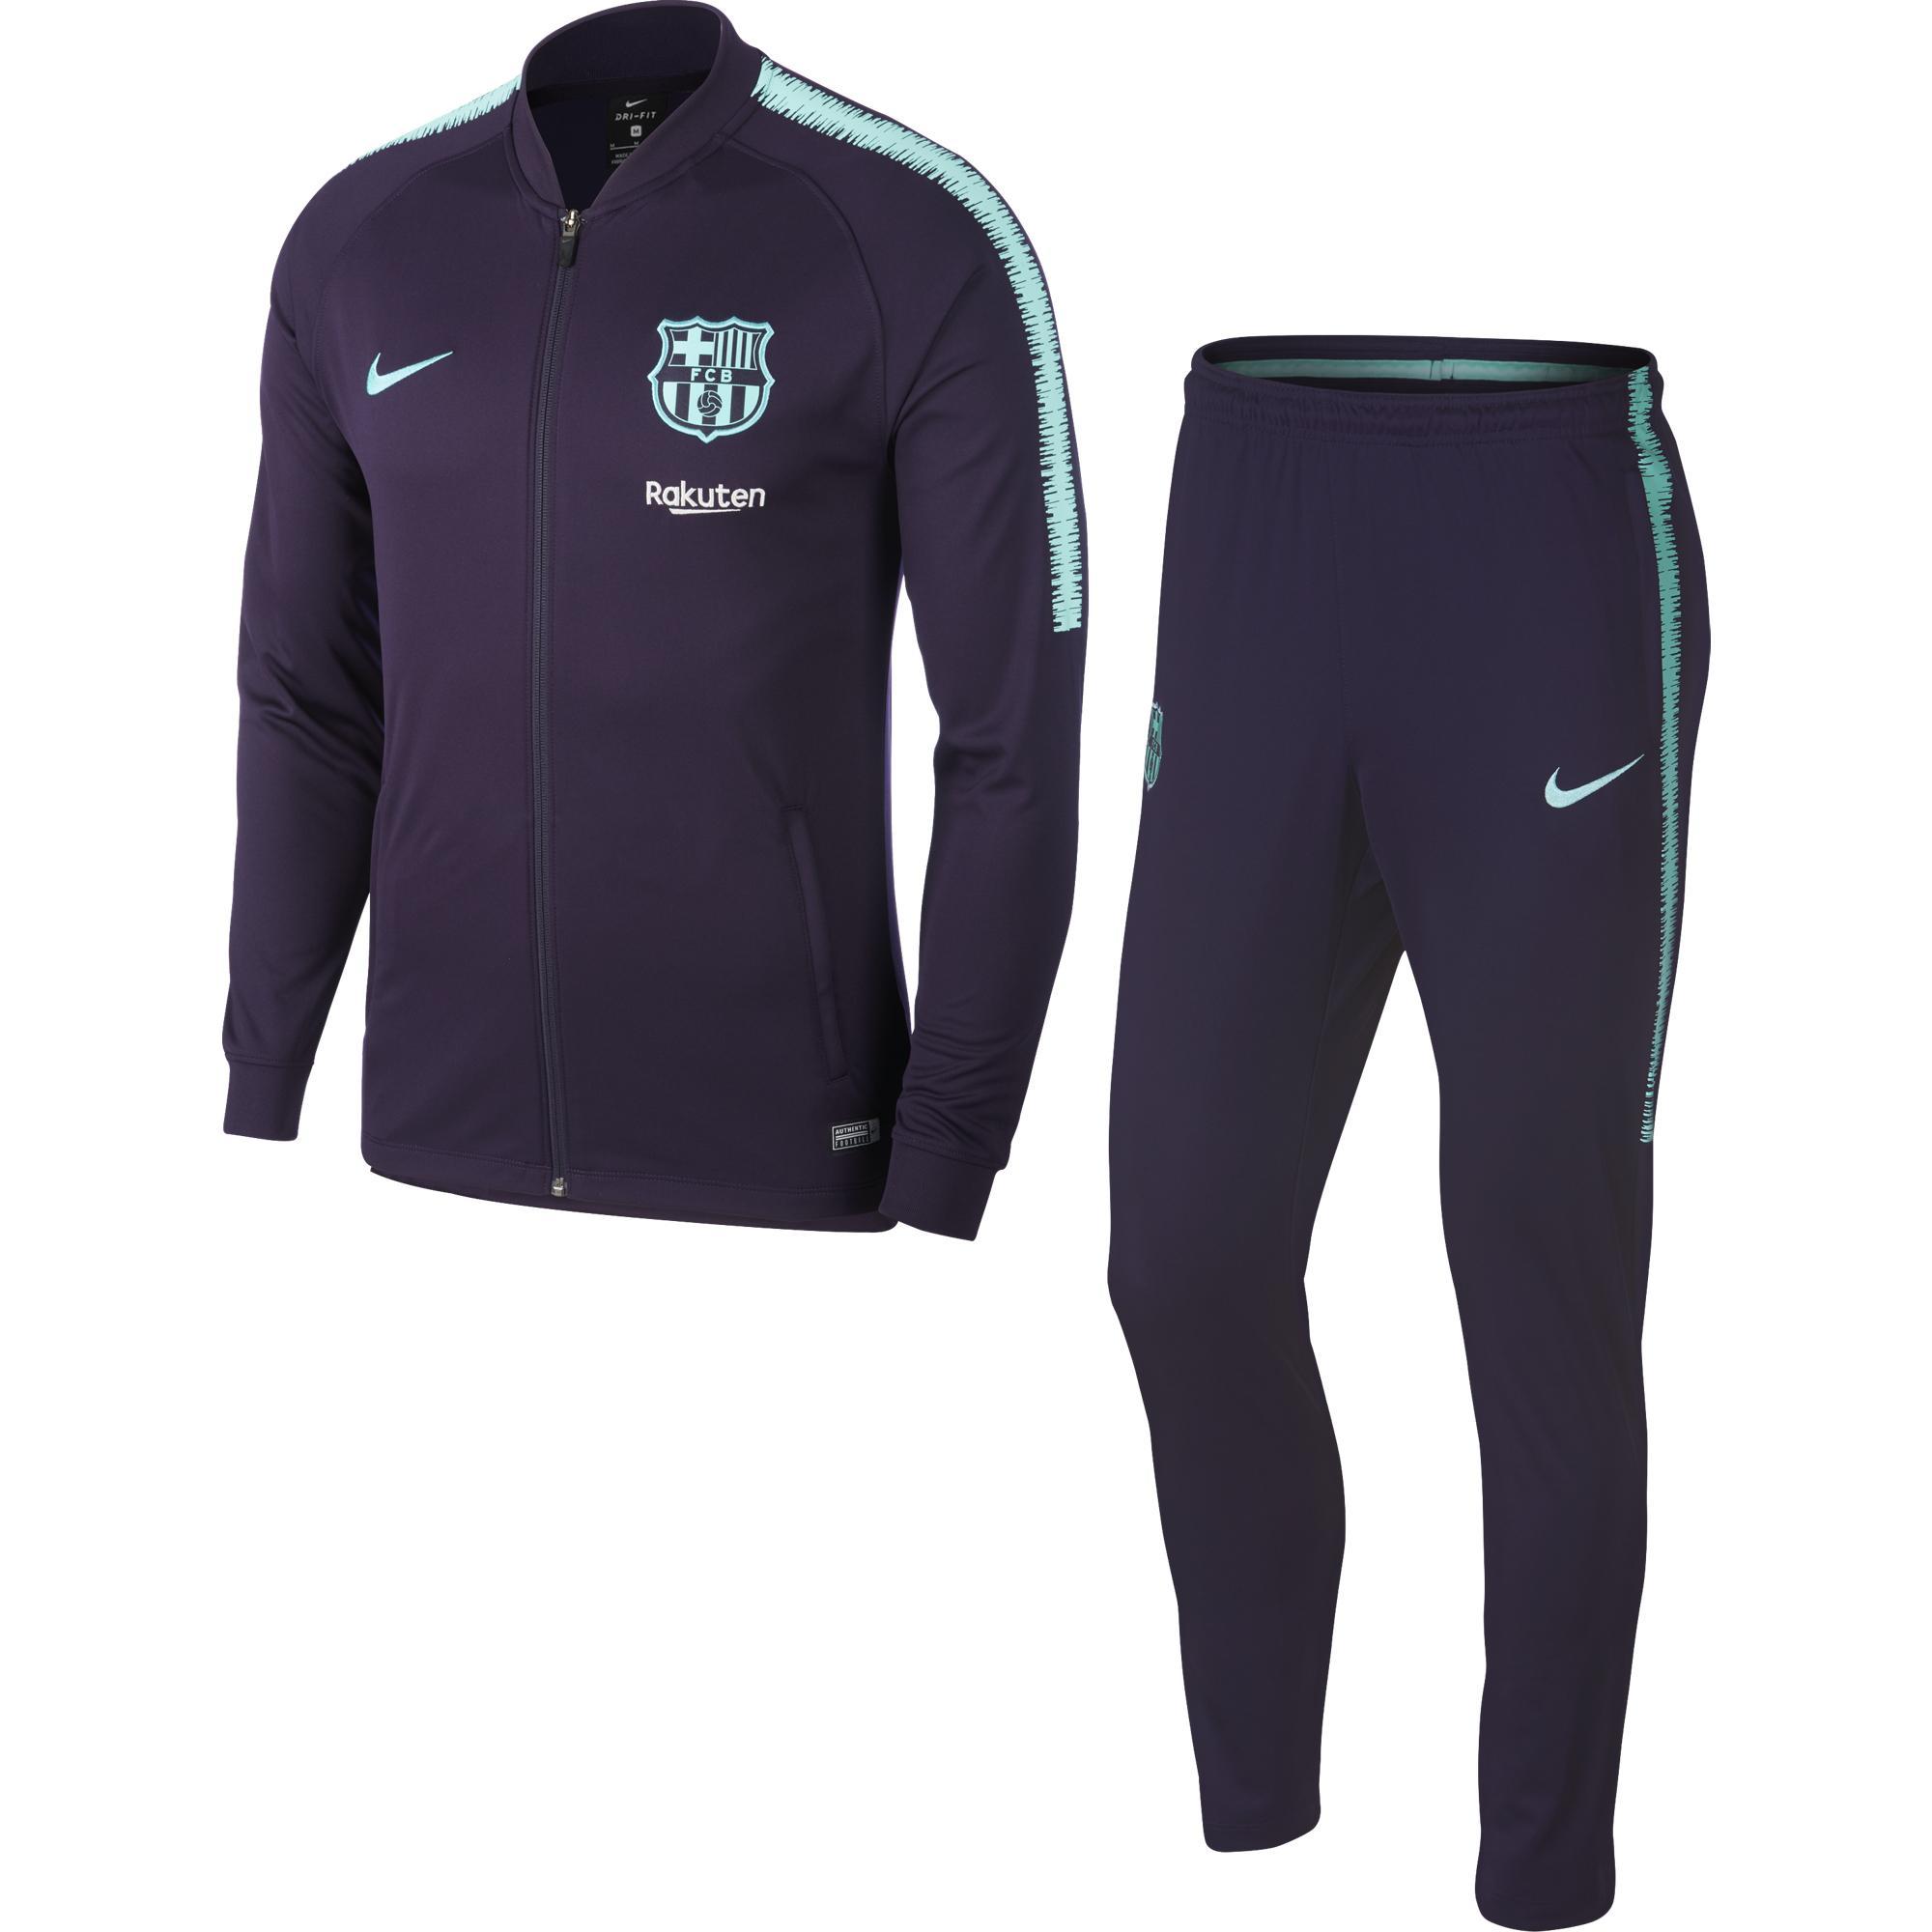 e0ff7367b Nike Tracksuit Barcelona Purple Dynasty hyper Turq hyper Turq ...